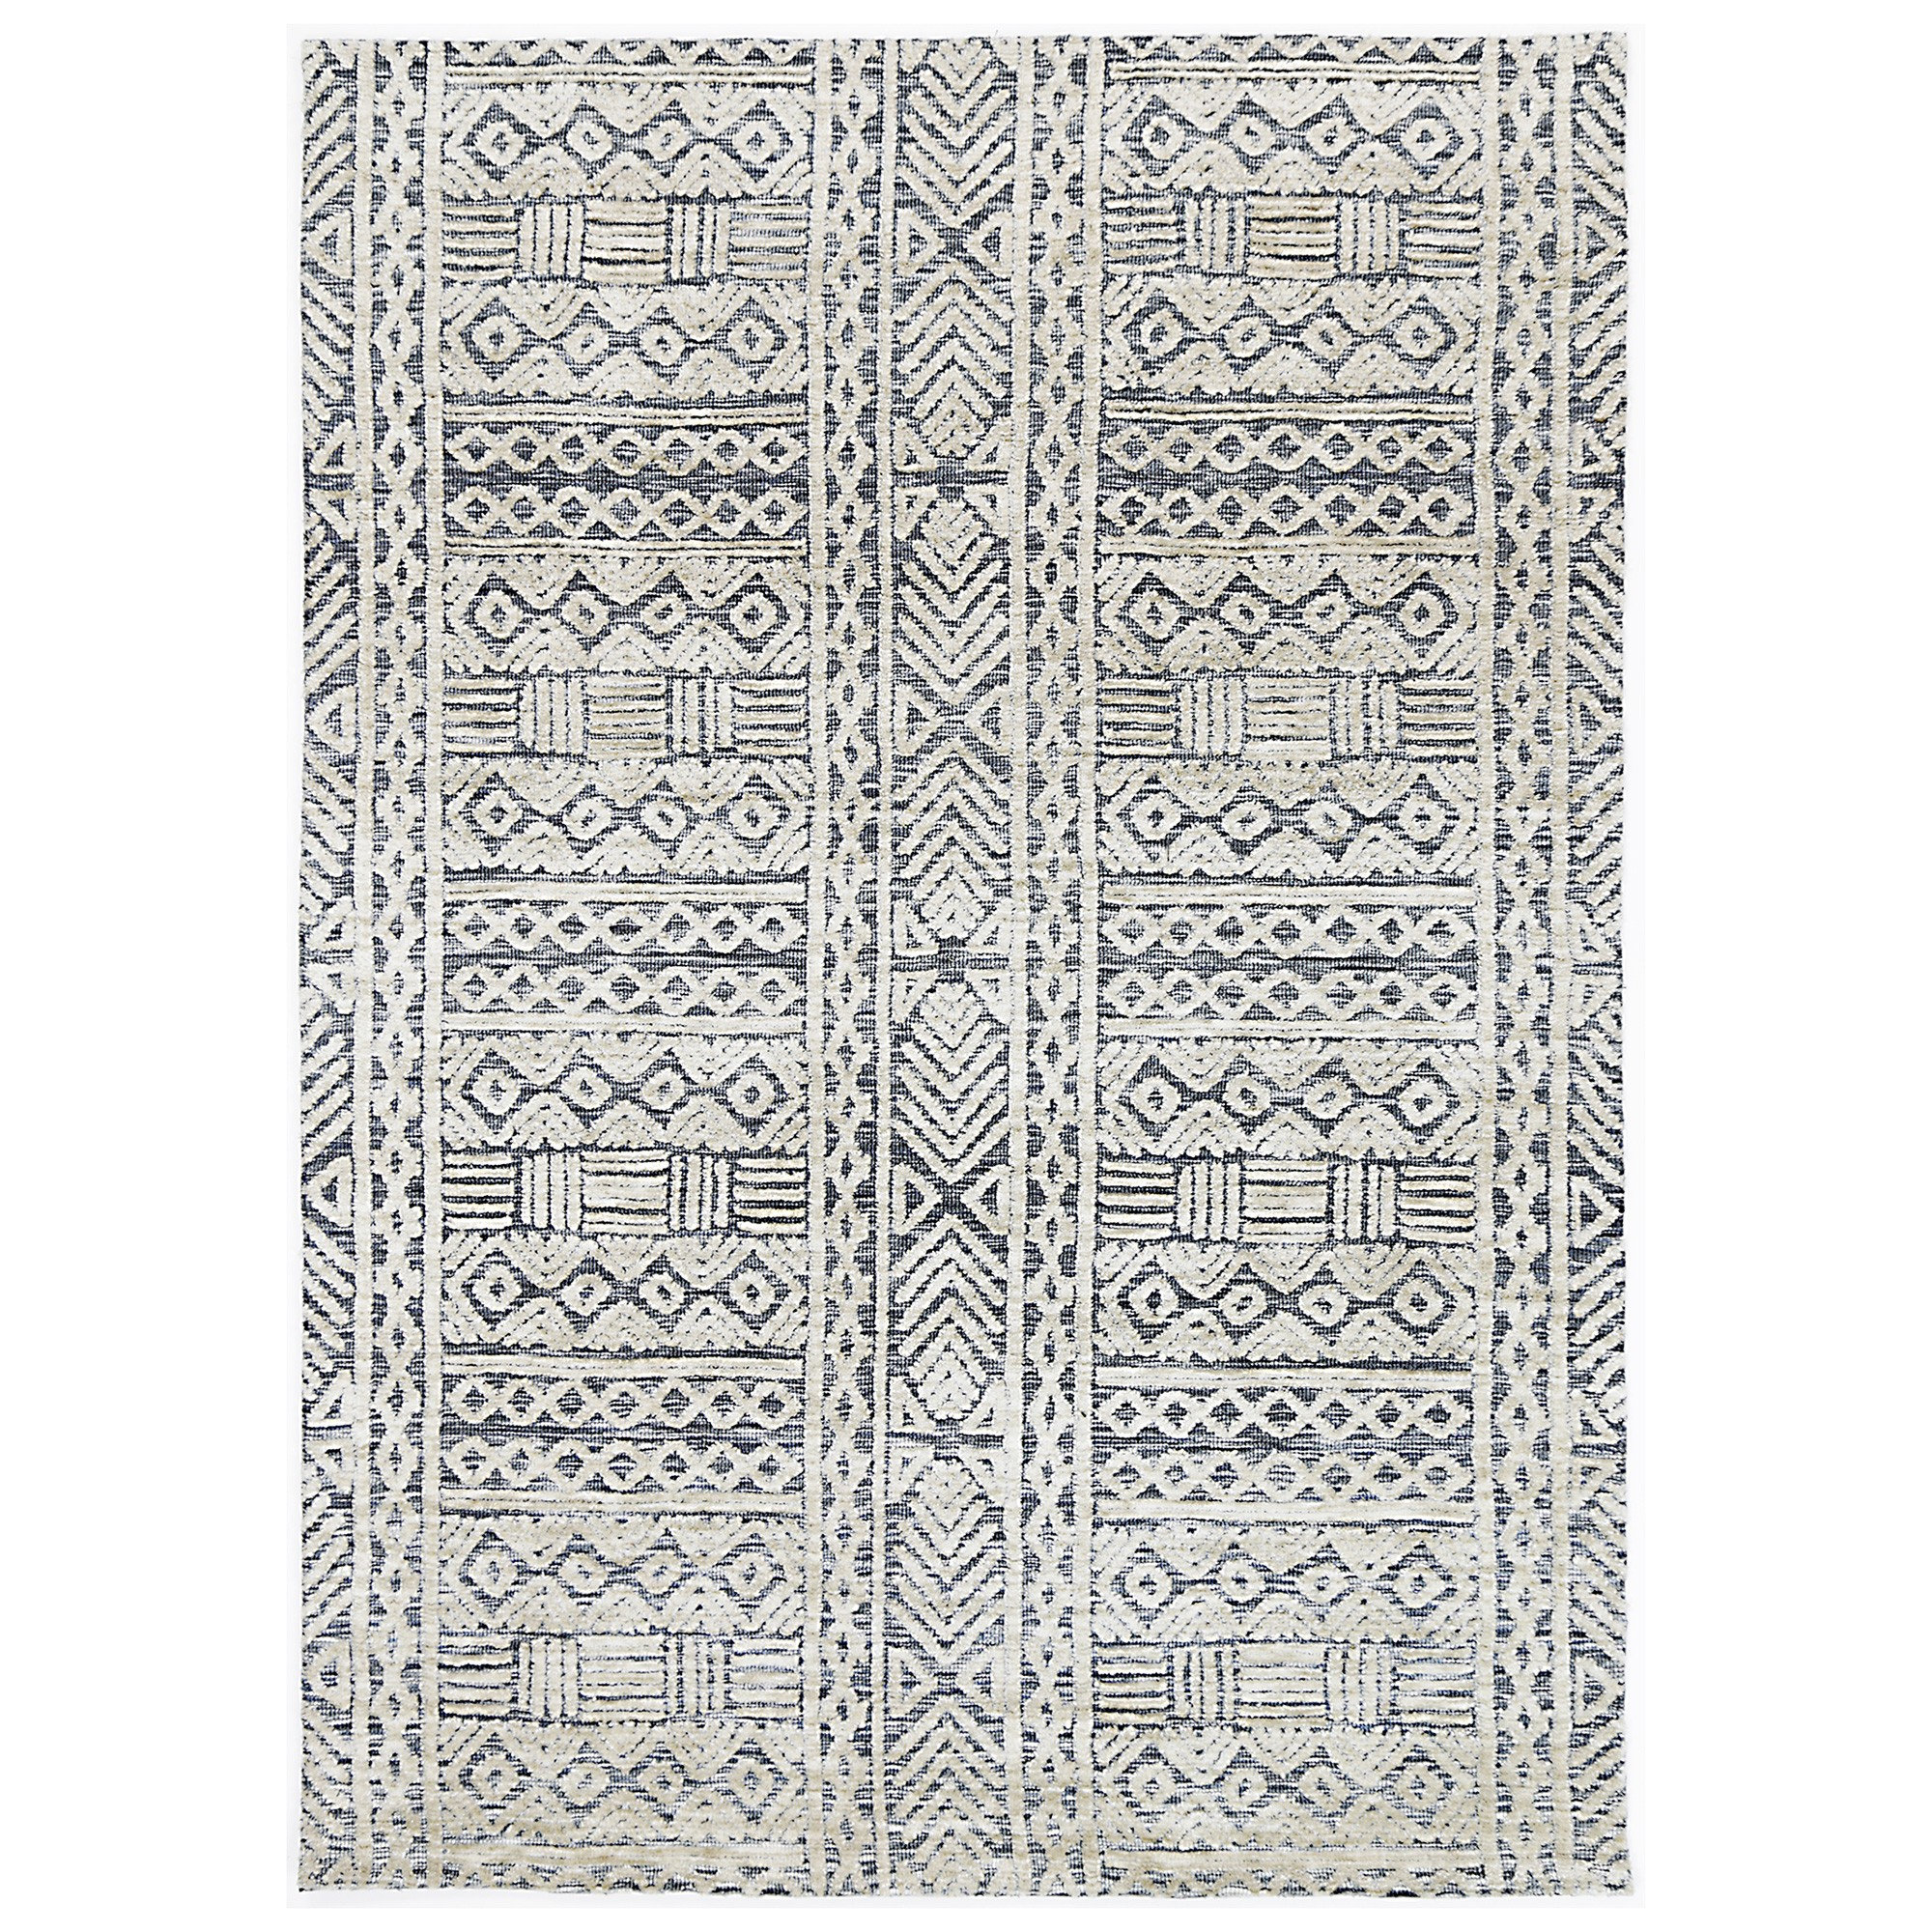 Amristar Glenroy Hand Tufted Wool Rug, 330x240cm, Navy